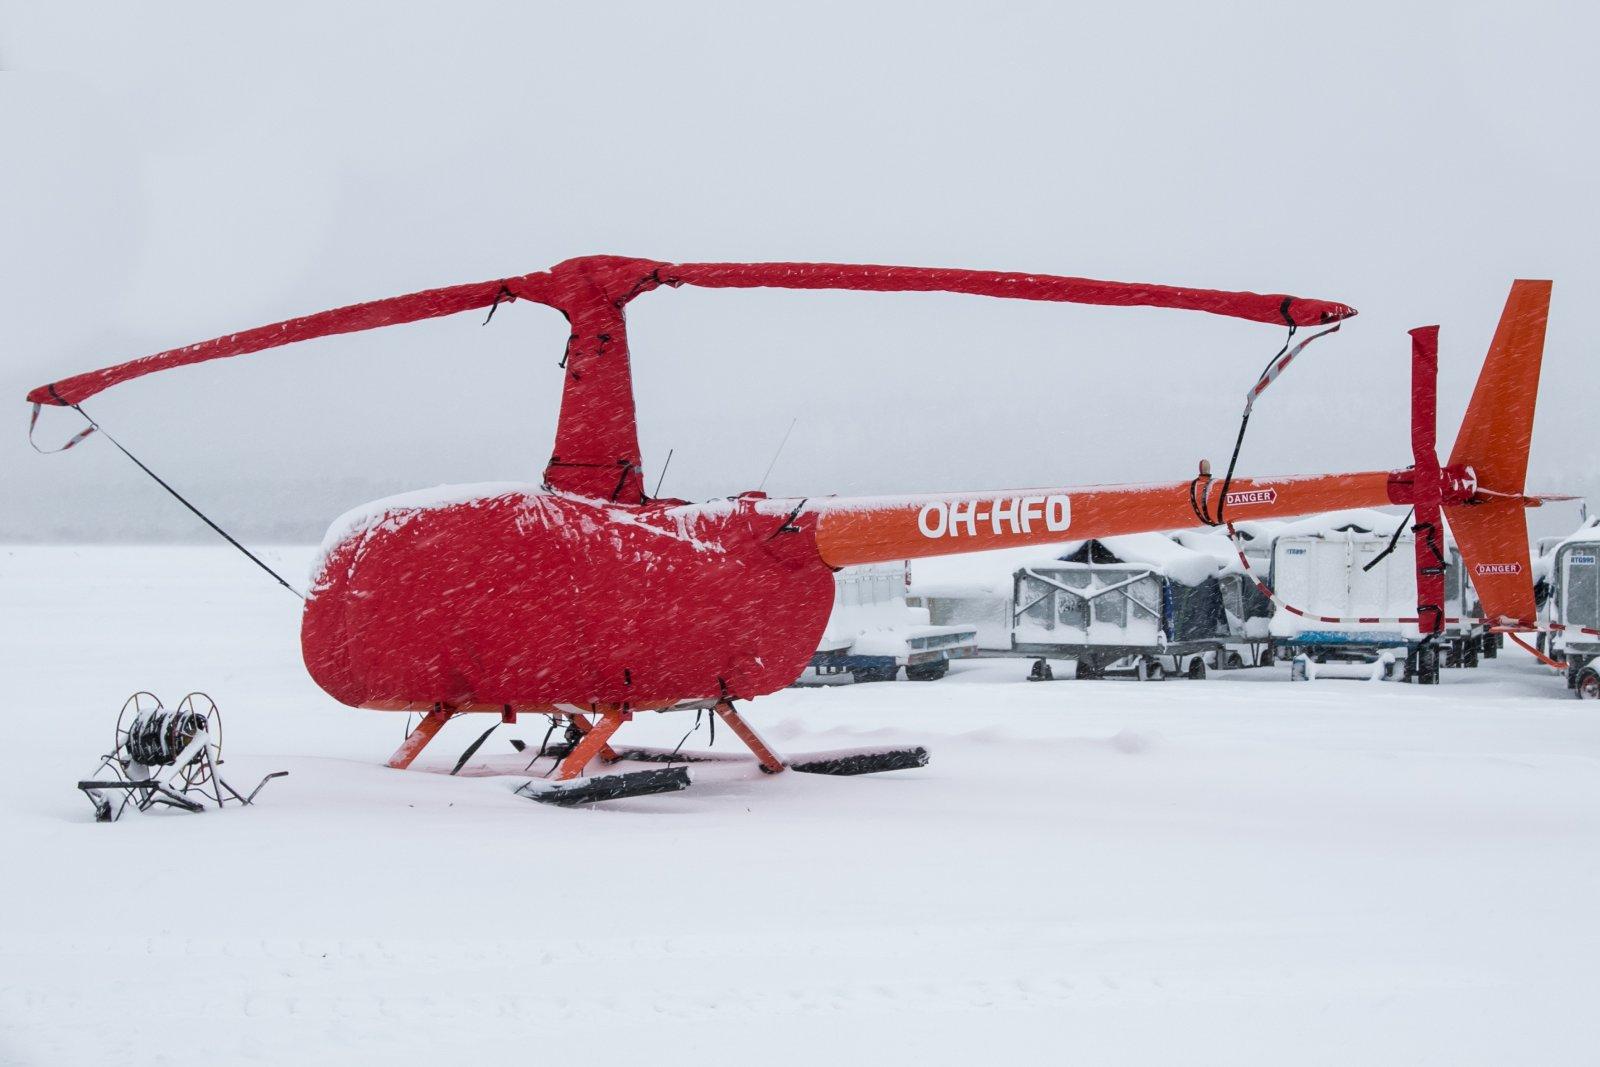 OH-HFD. Robinson R44 Clipper II